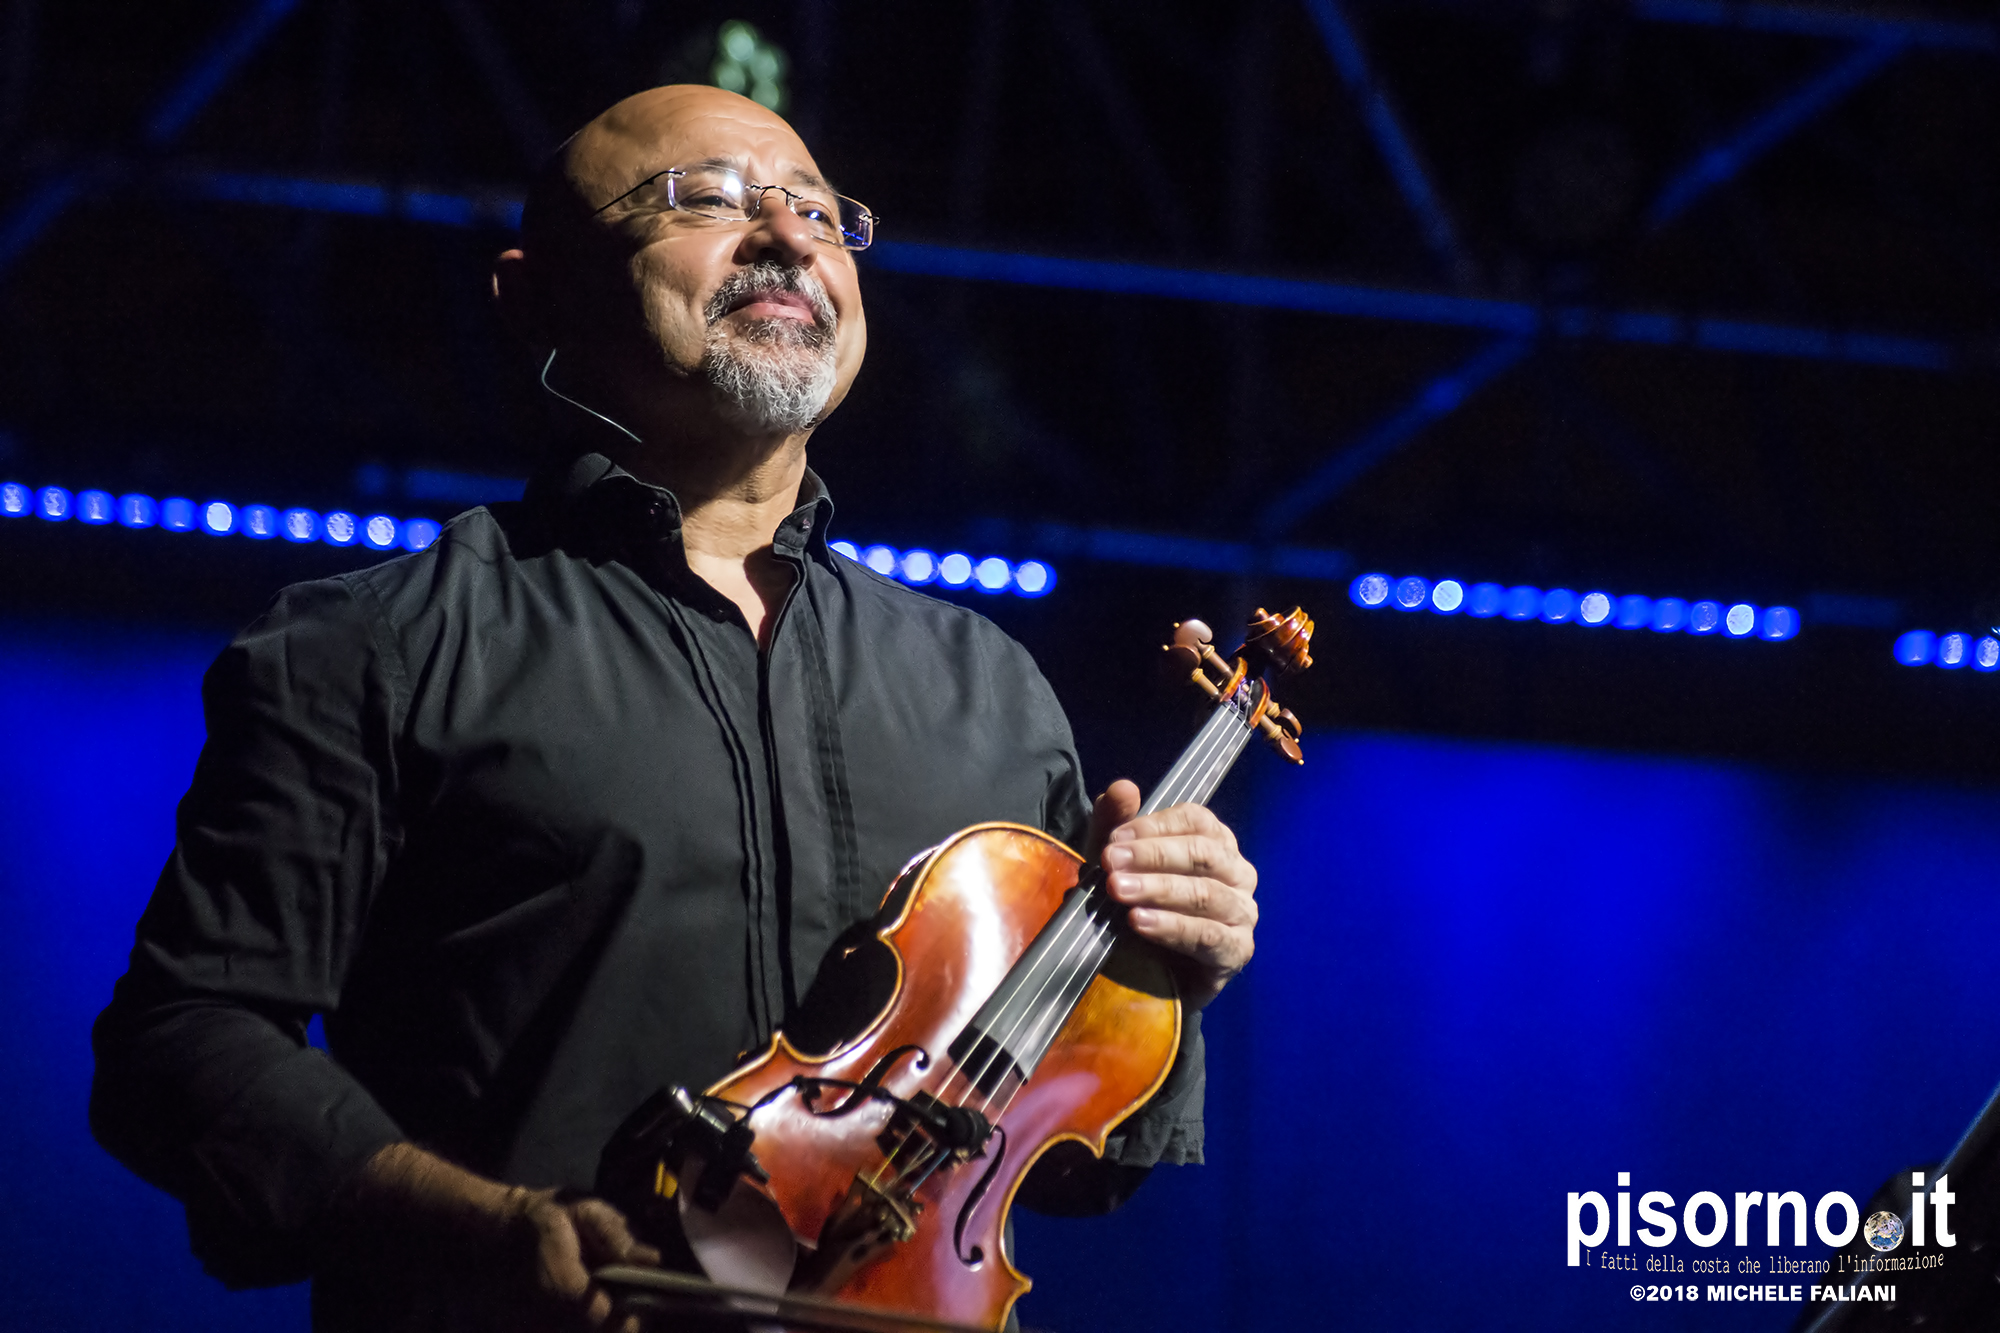 Peppe Servillo & Solis String Quartet 21